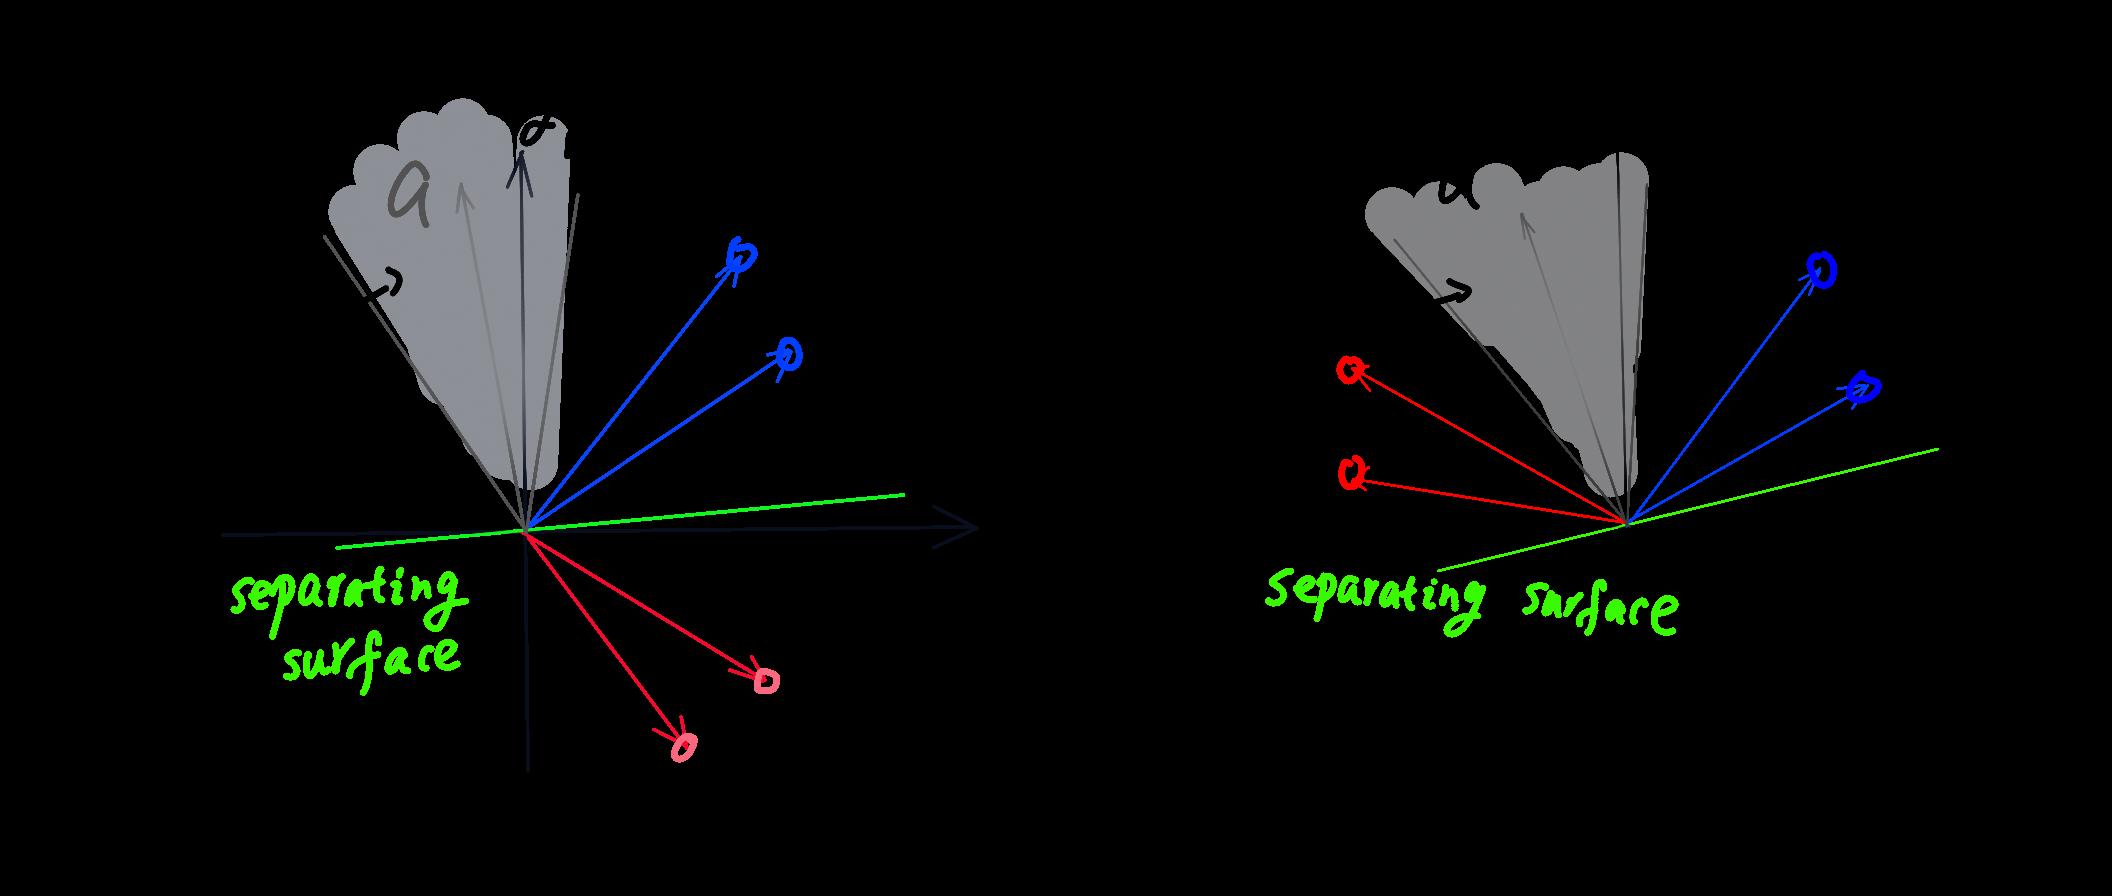 解向量图.png-414.5kB